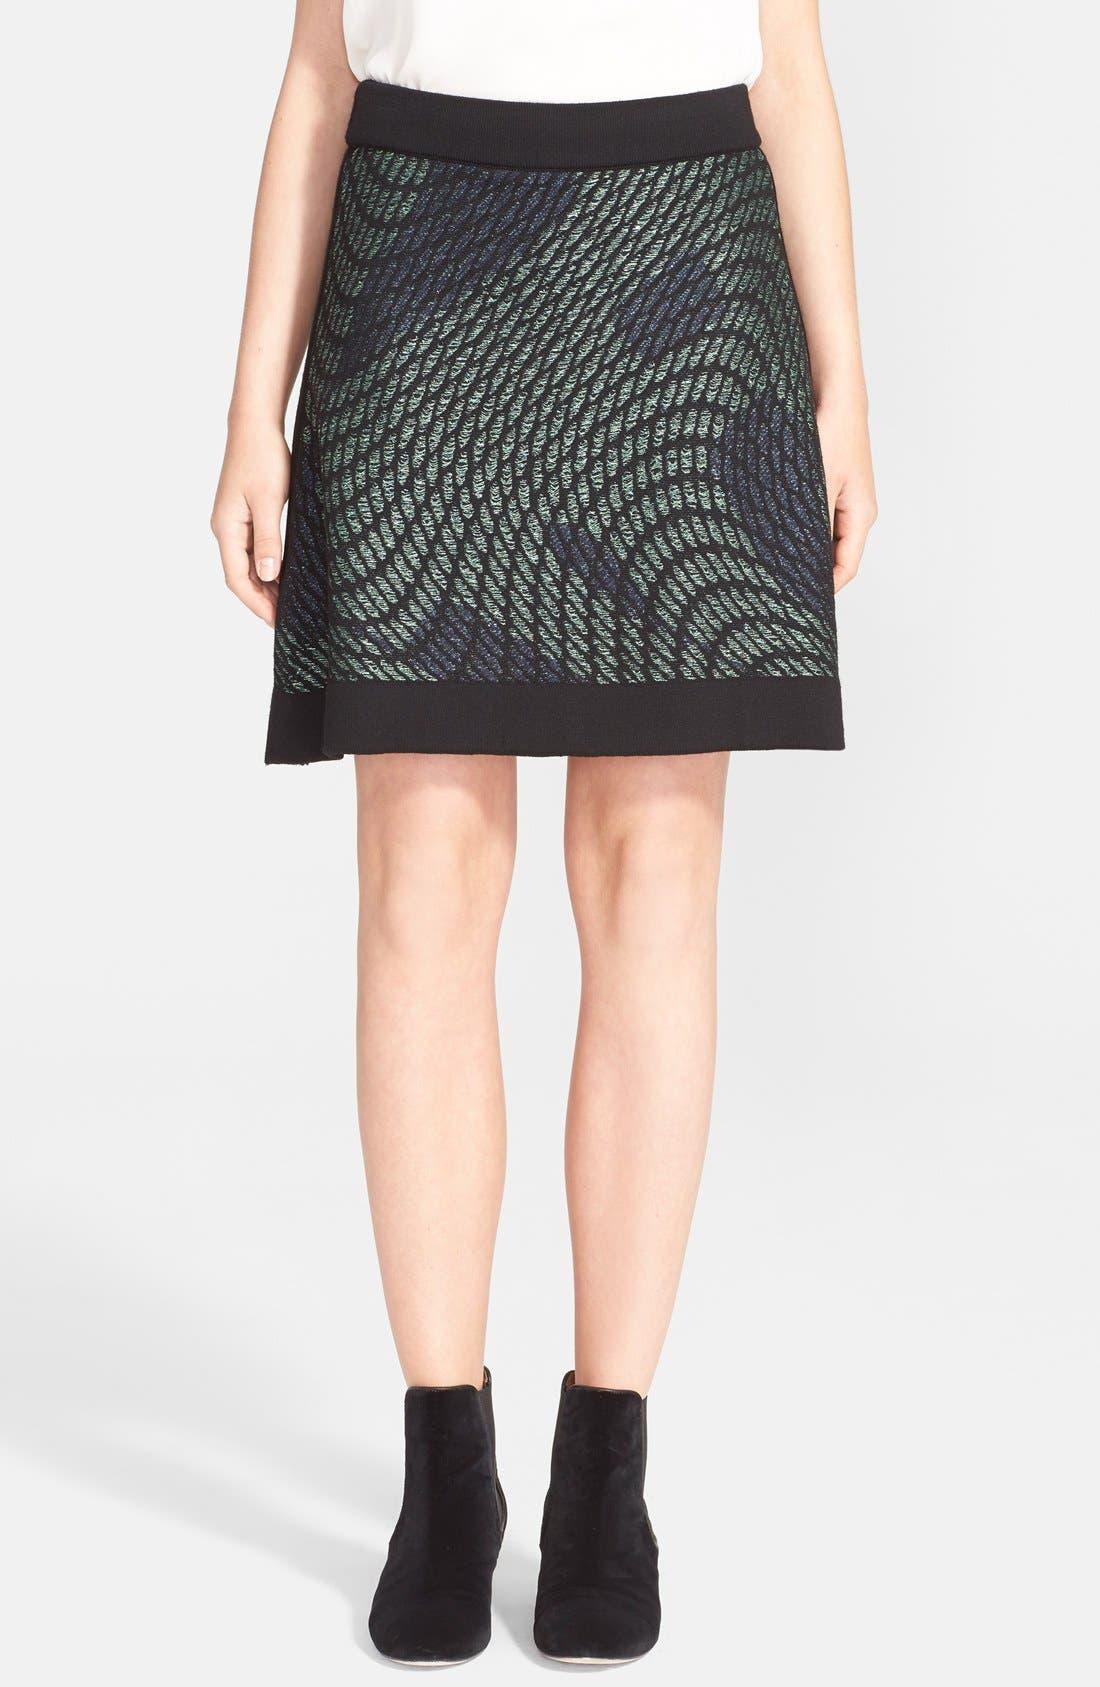 Alternate Image 1 Selected - M Missoni Graphic Knit Skirt